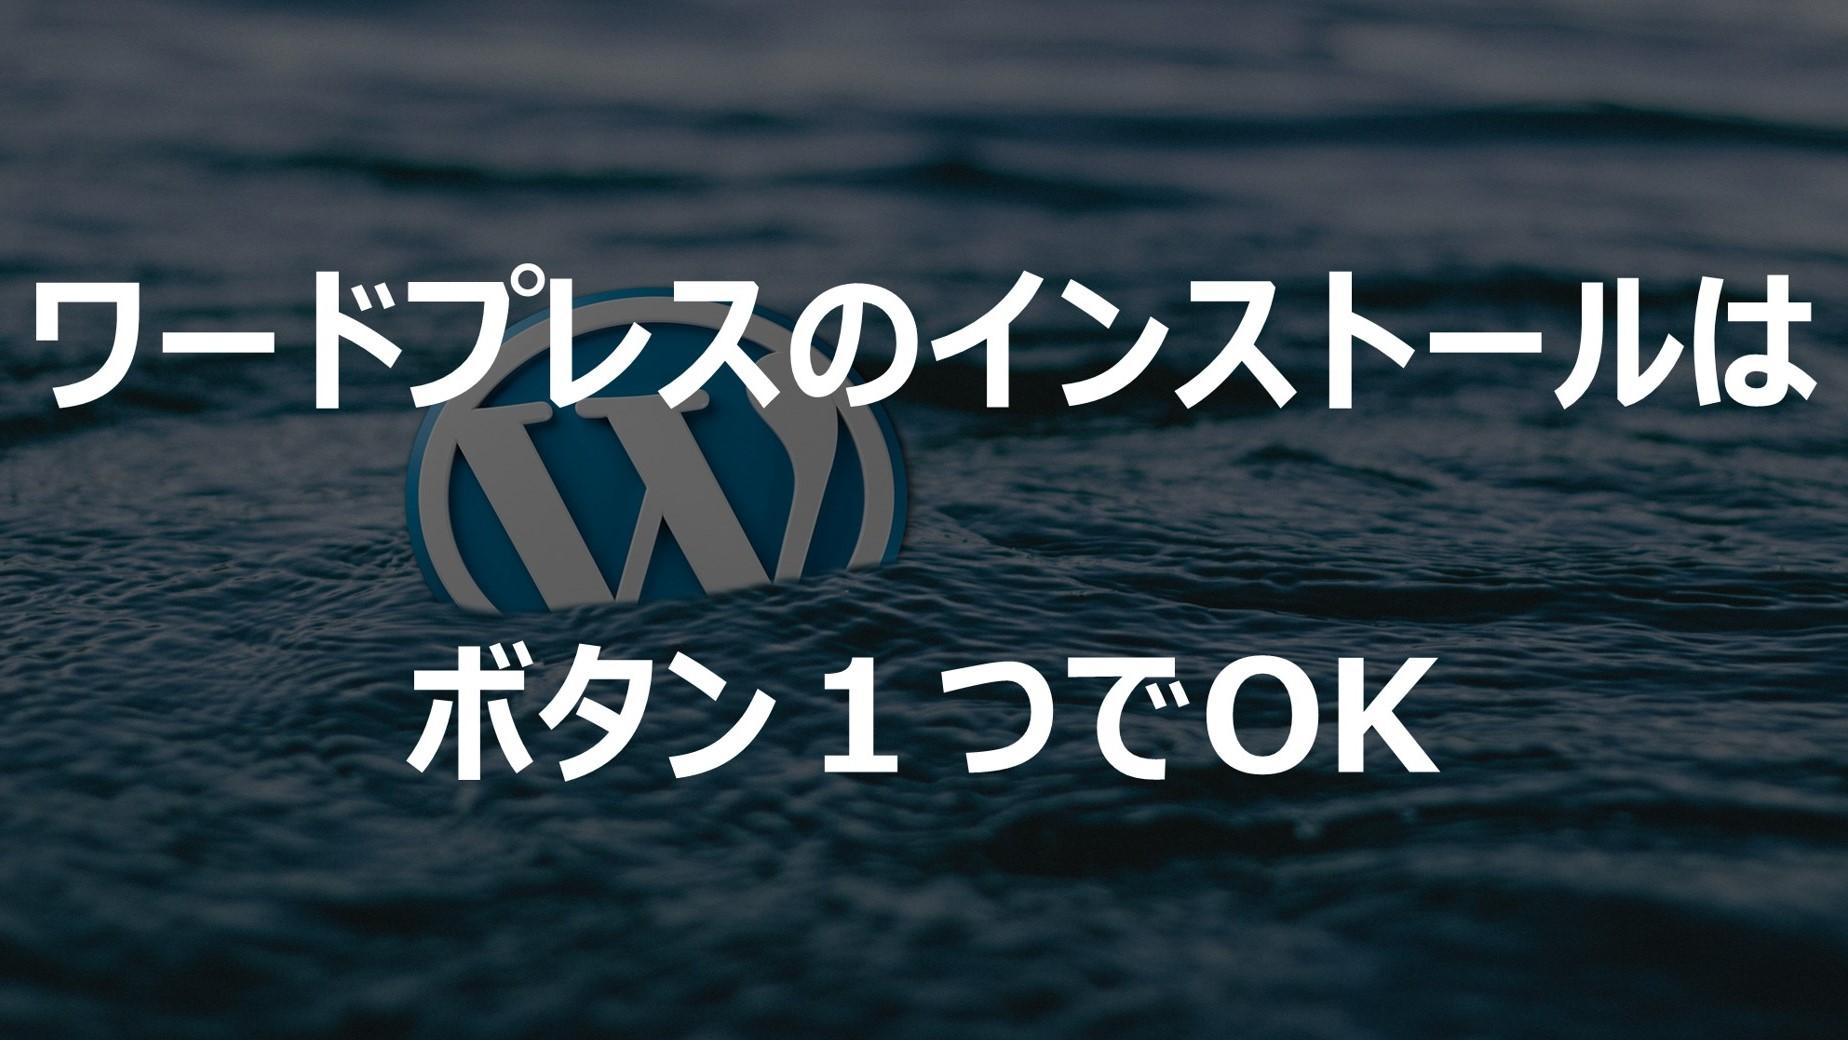 Xサーバーにワードプレスをインストールする方法